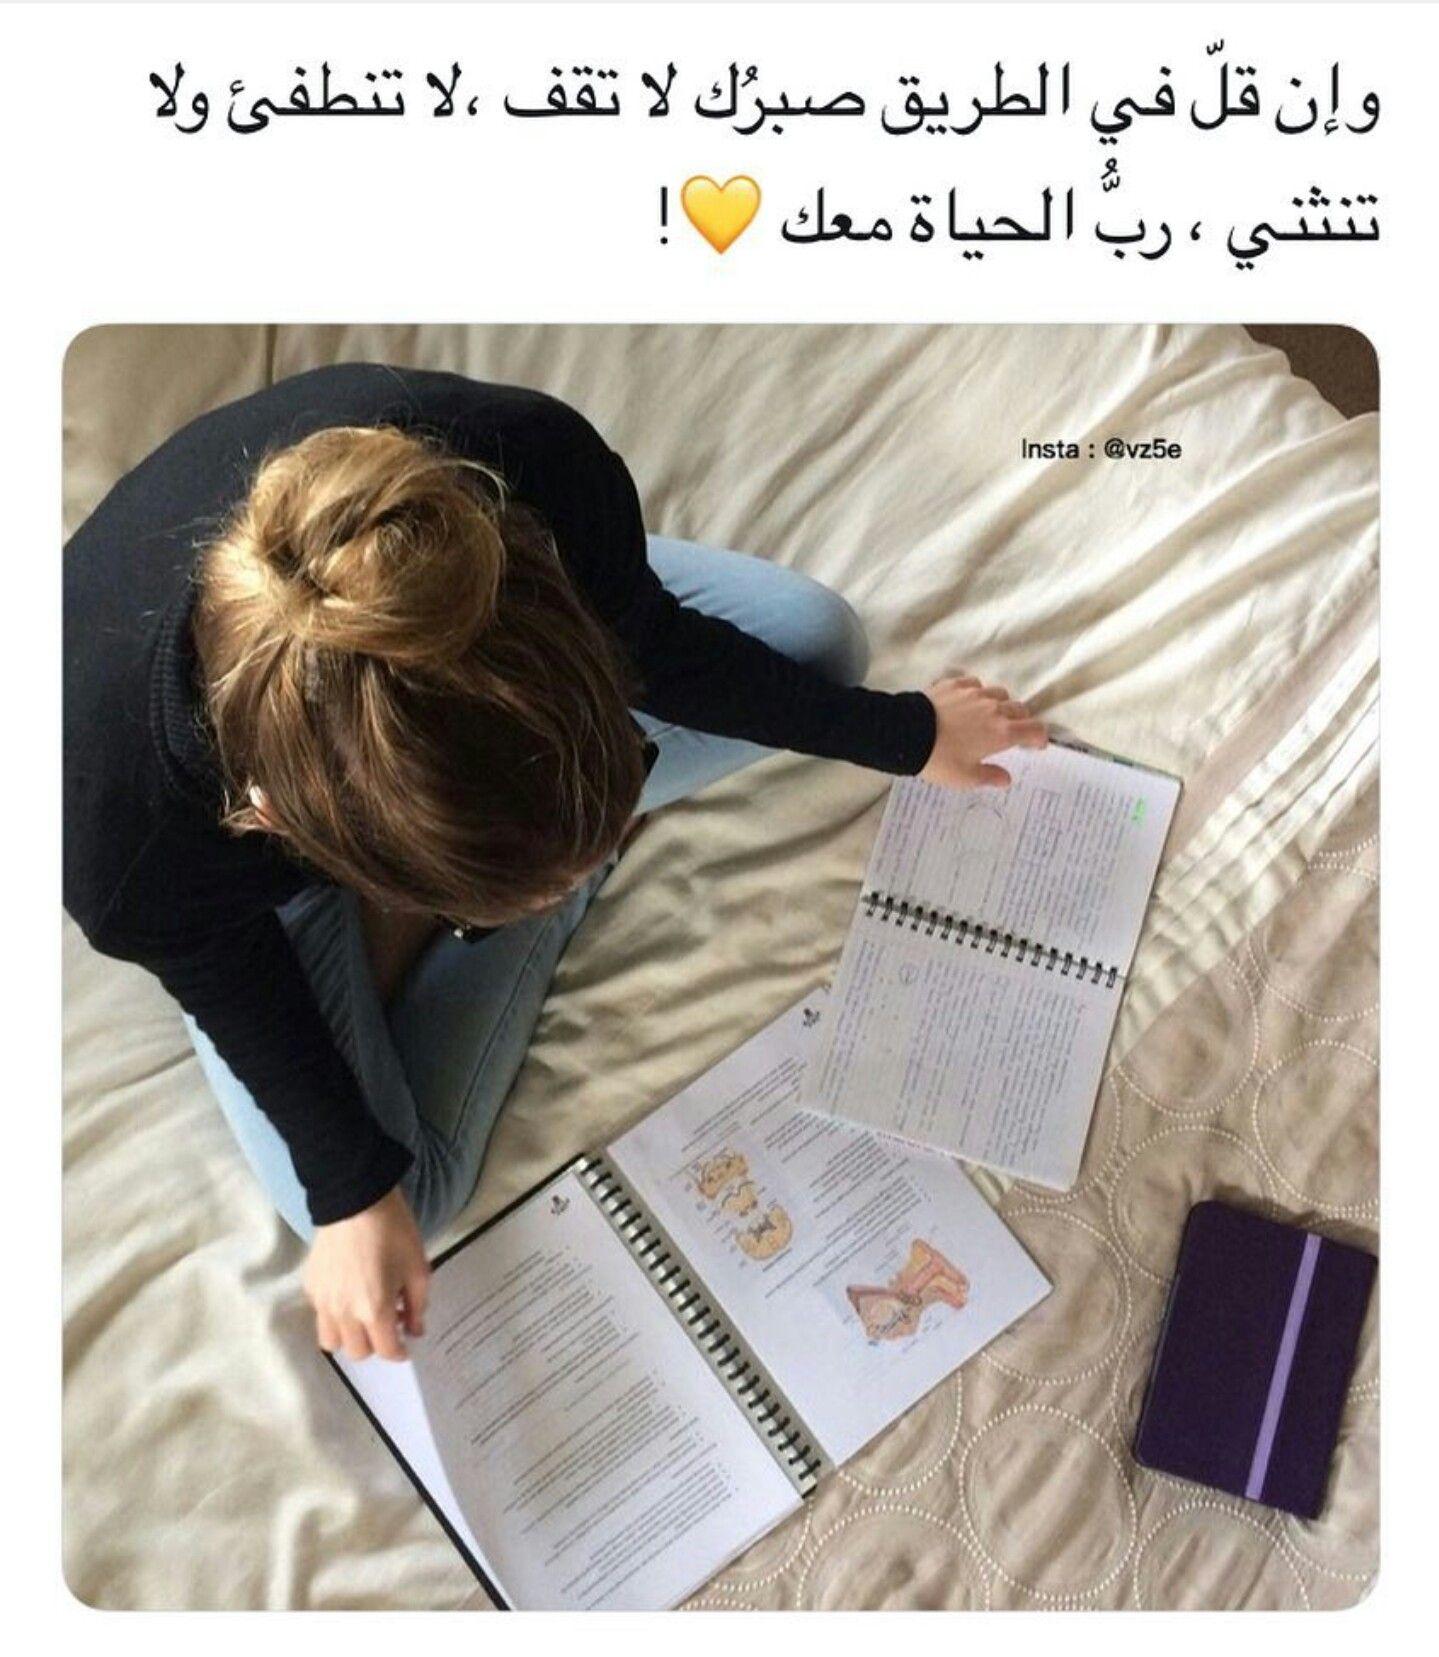 يااااارب قويني لا حول ولا قوة الا بالله Study Quotes Arabic Quotes Study Motivation Quotes